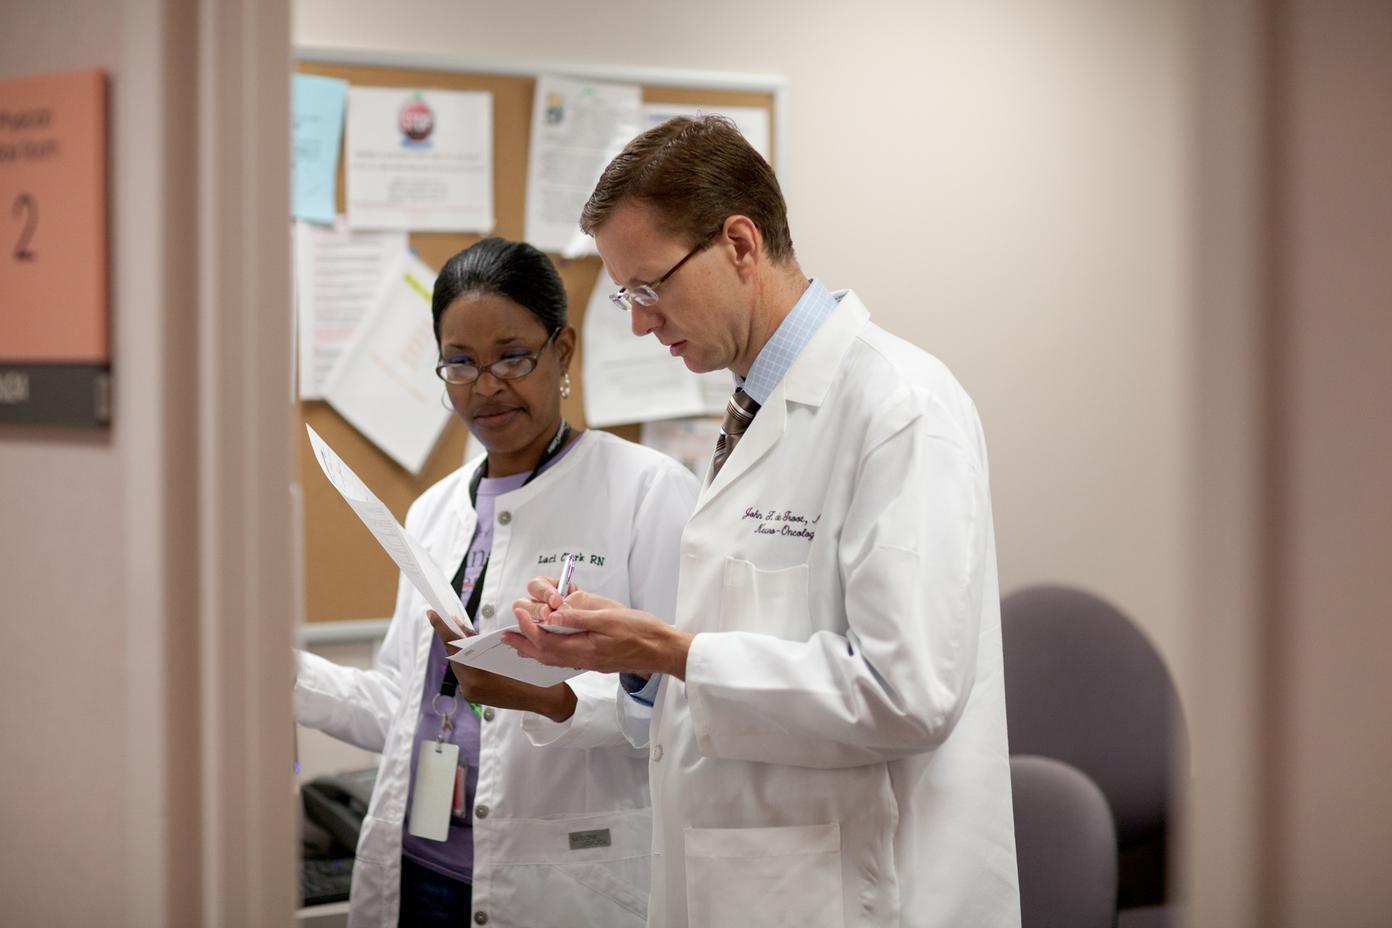 John de Groot, M D  - Neuro-Oncology Faculty | MD Anderson